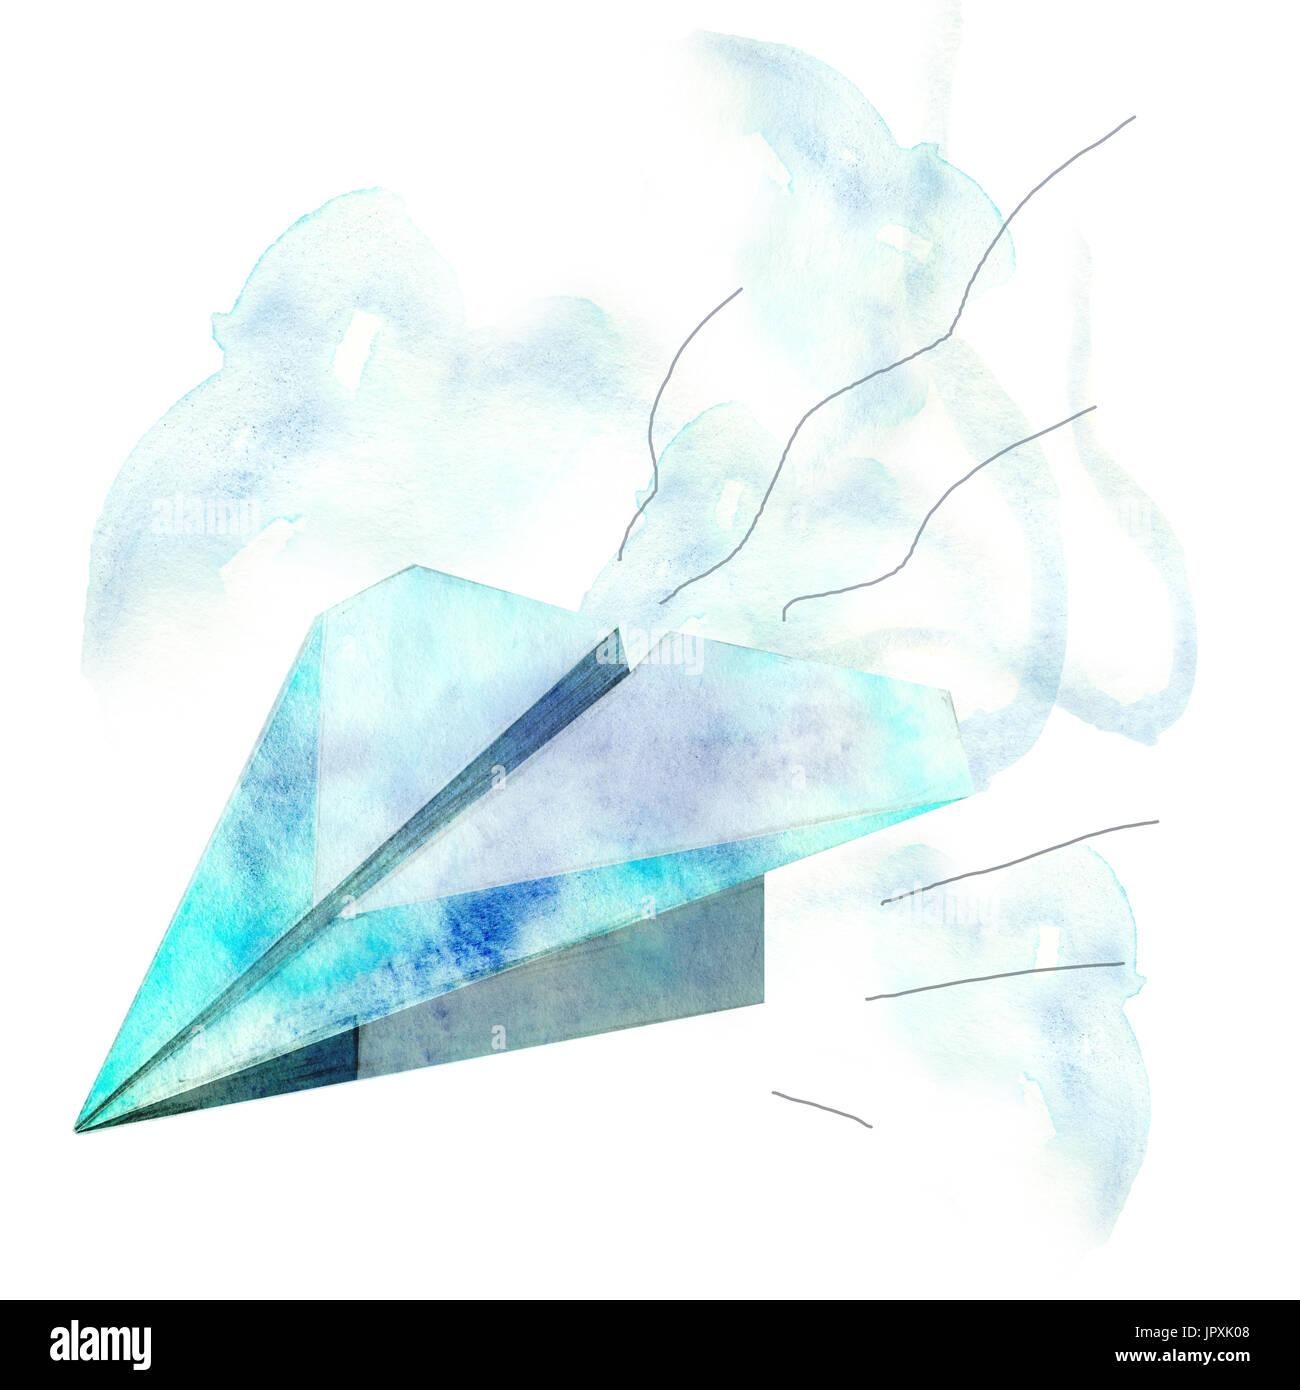 Aquarell Hand gezeichnete Papierflieger Stockbild